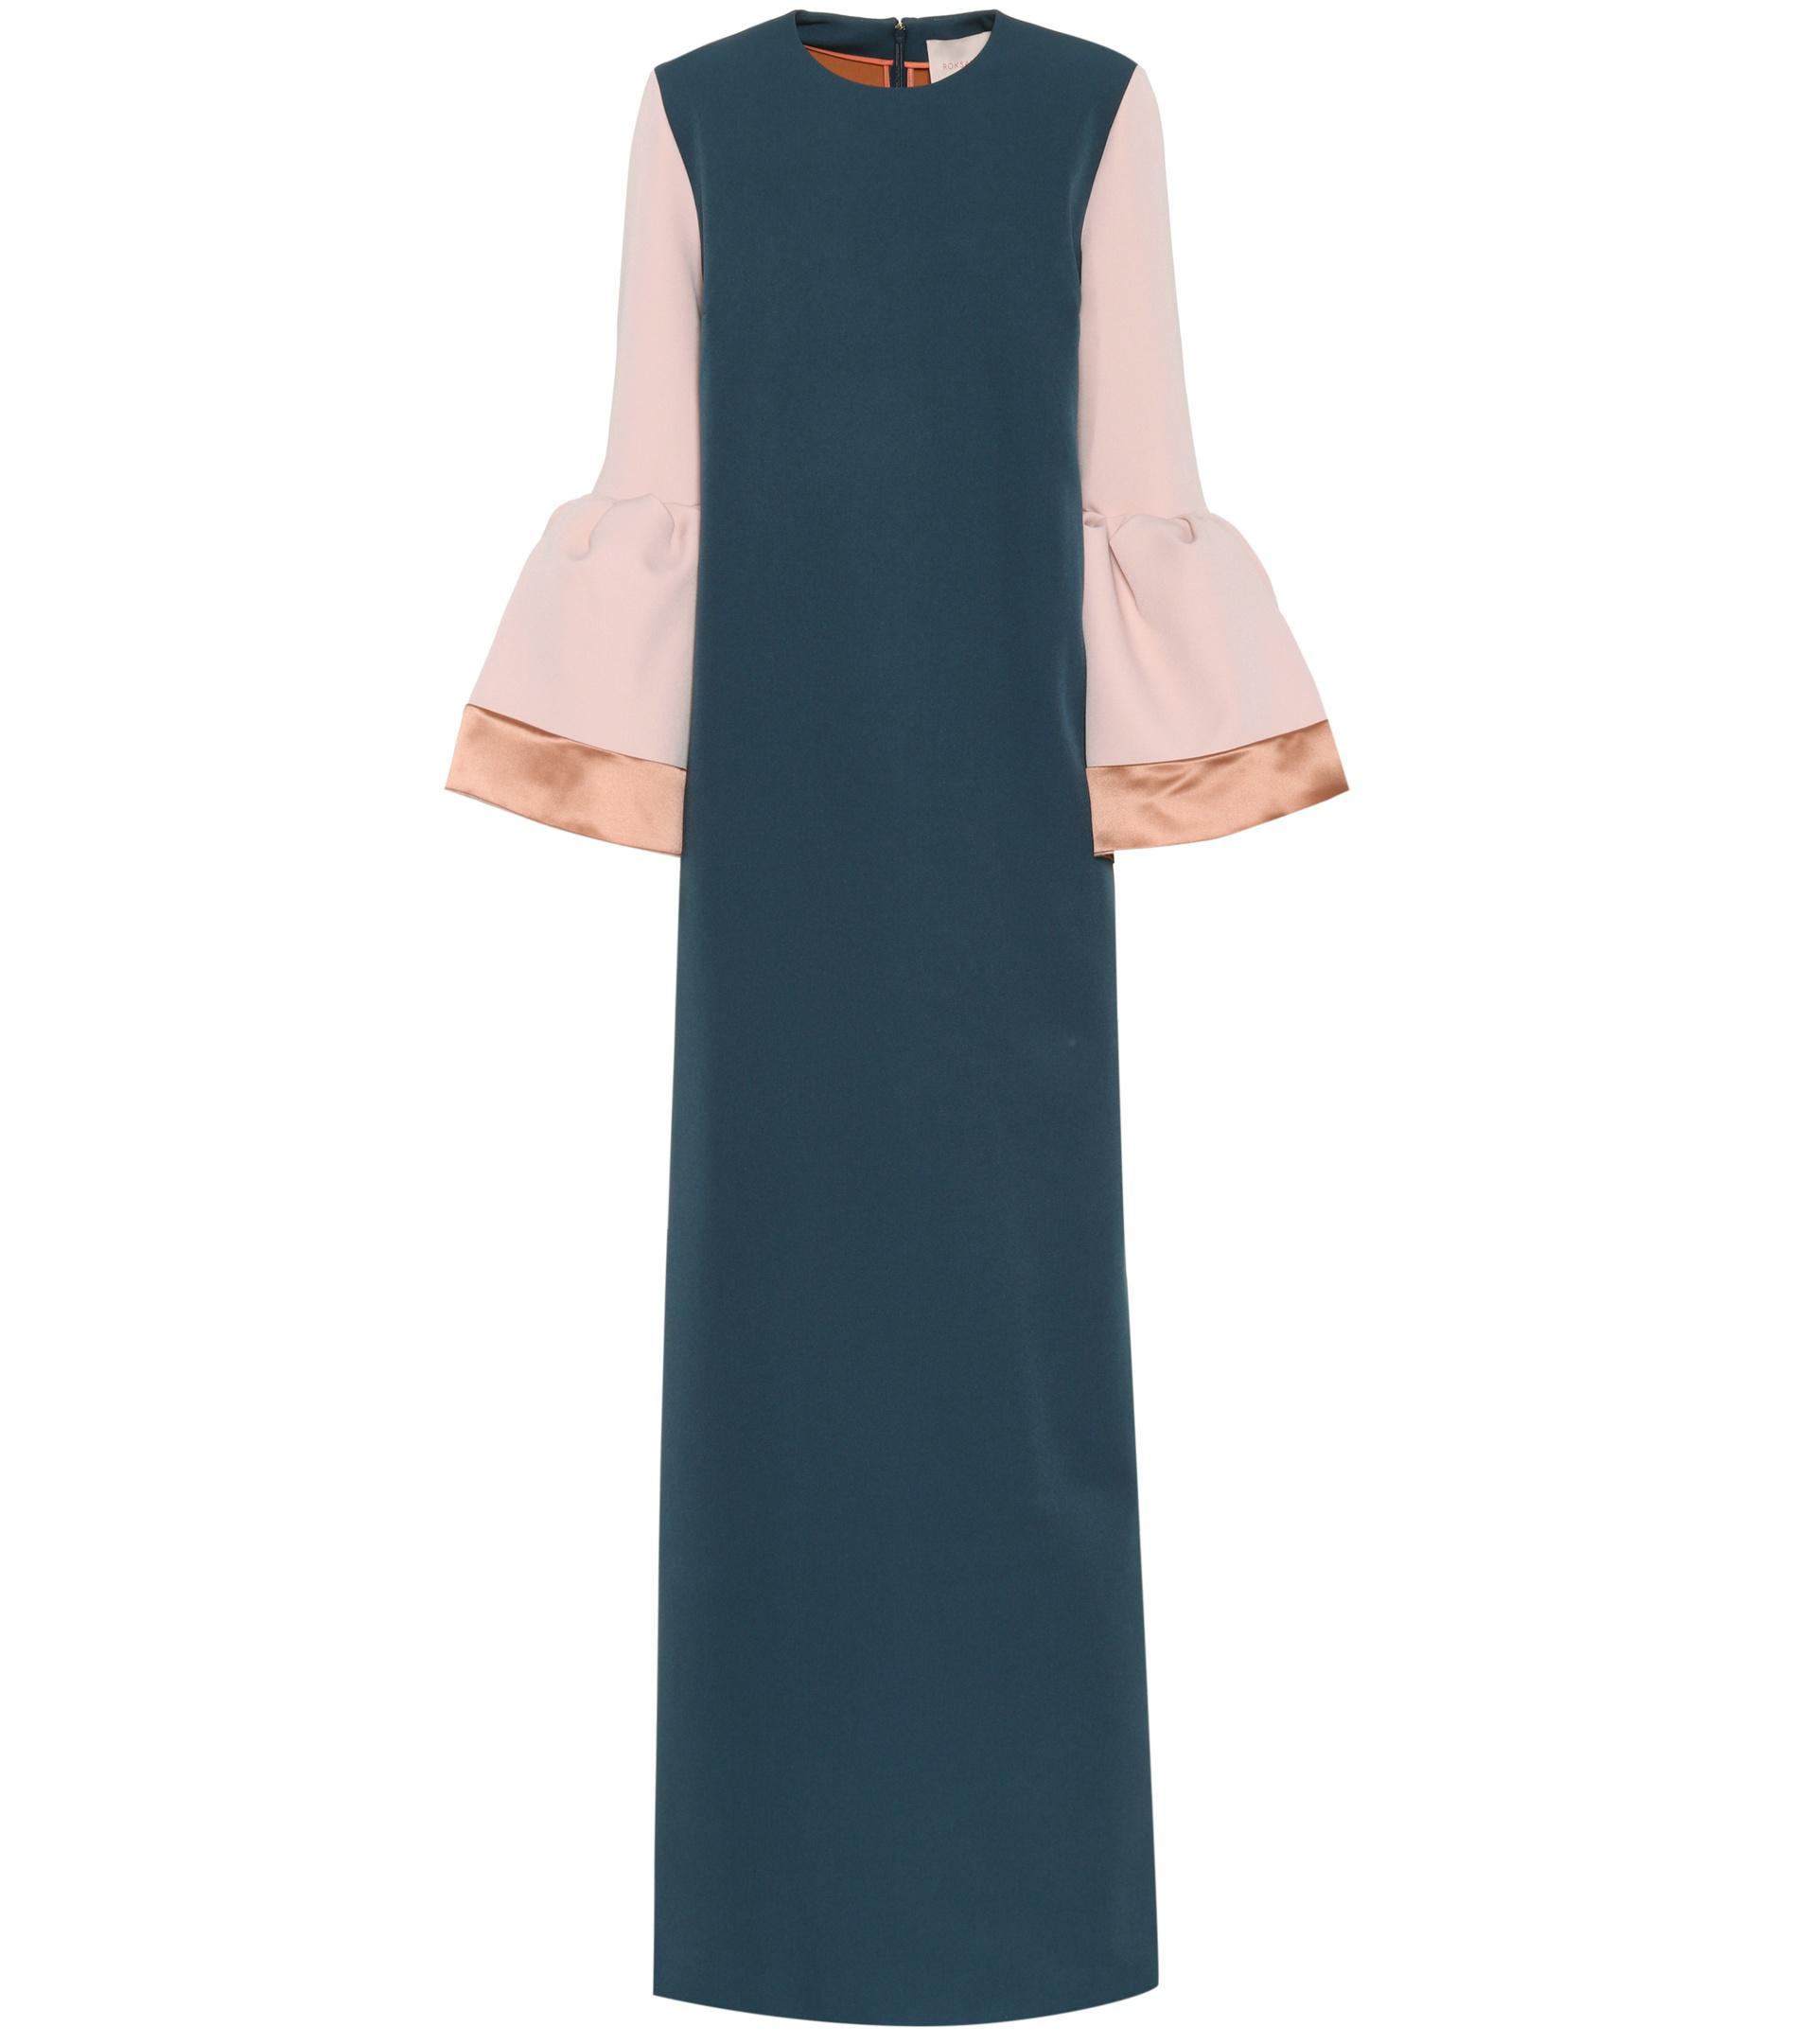 Litani bell-cuff stretch-crepe dress Roksanda Ilincic qSKyToF